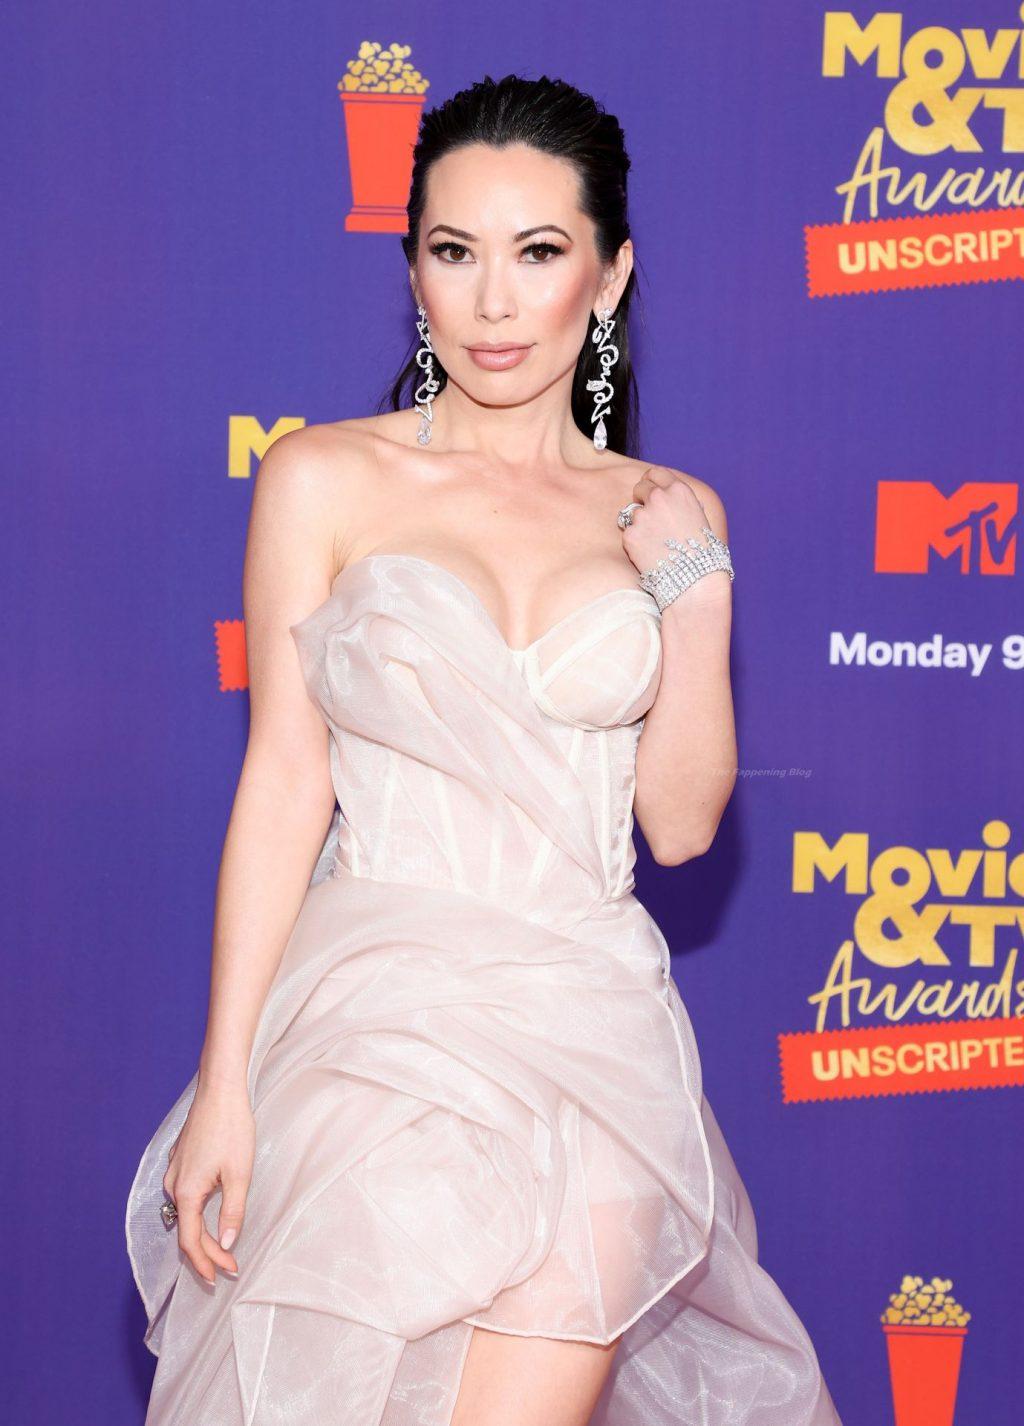 Christine Chiu Shows Off Her Boobs at the 2021 MTV Movie & TV Awards (9 Photos)